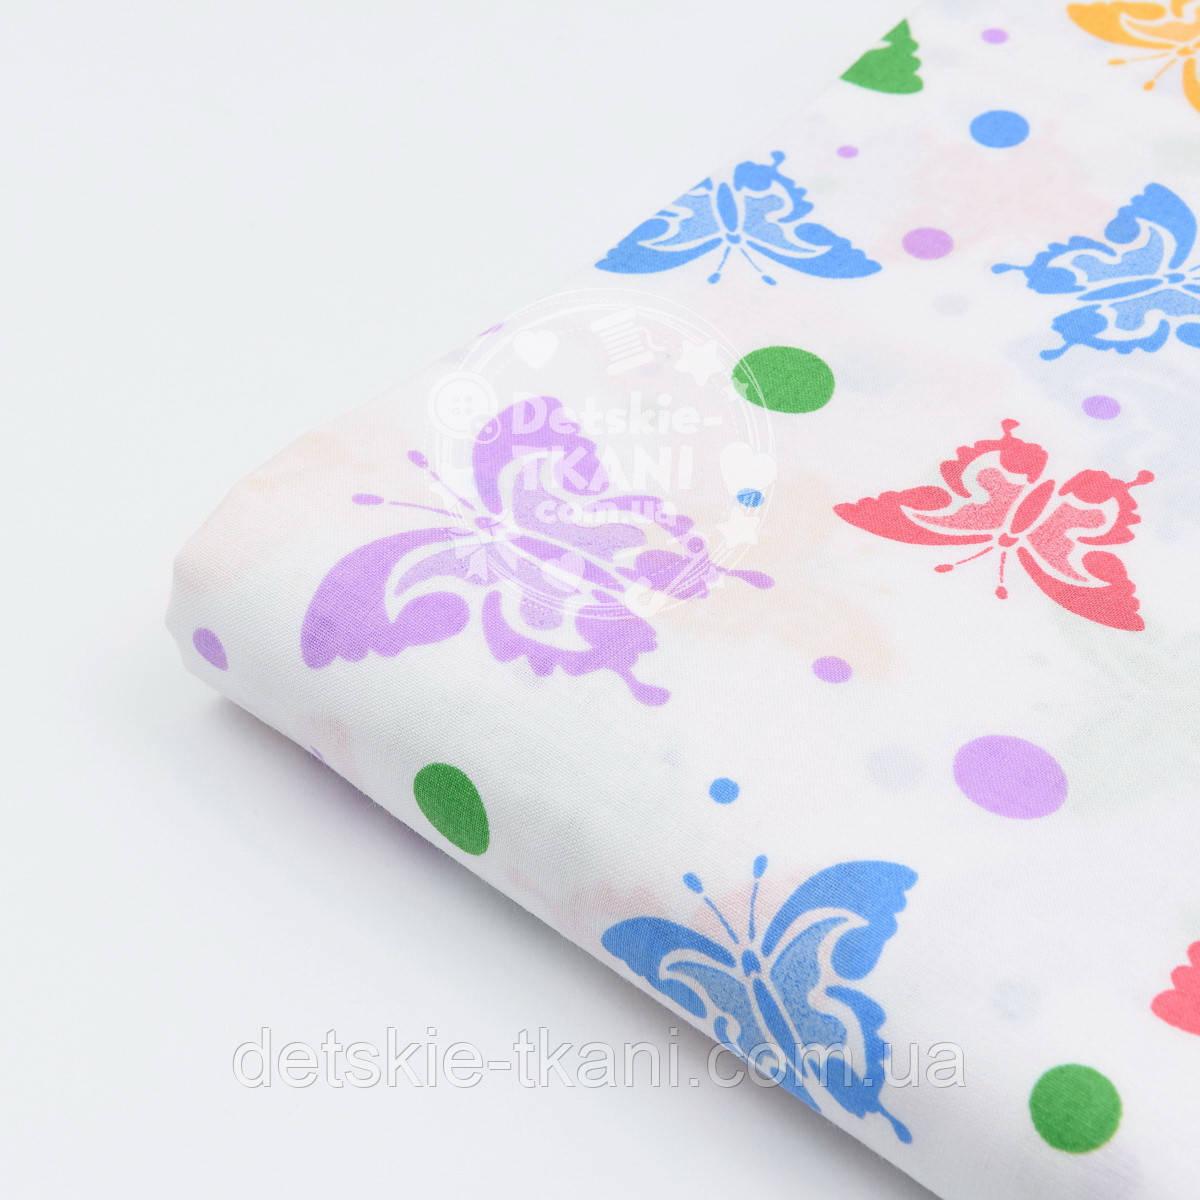 Лоскут ткани №591 размер 35*80 см